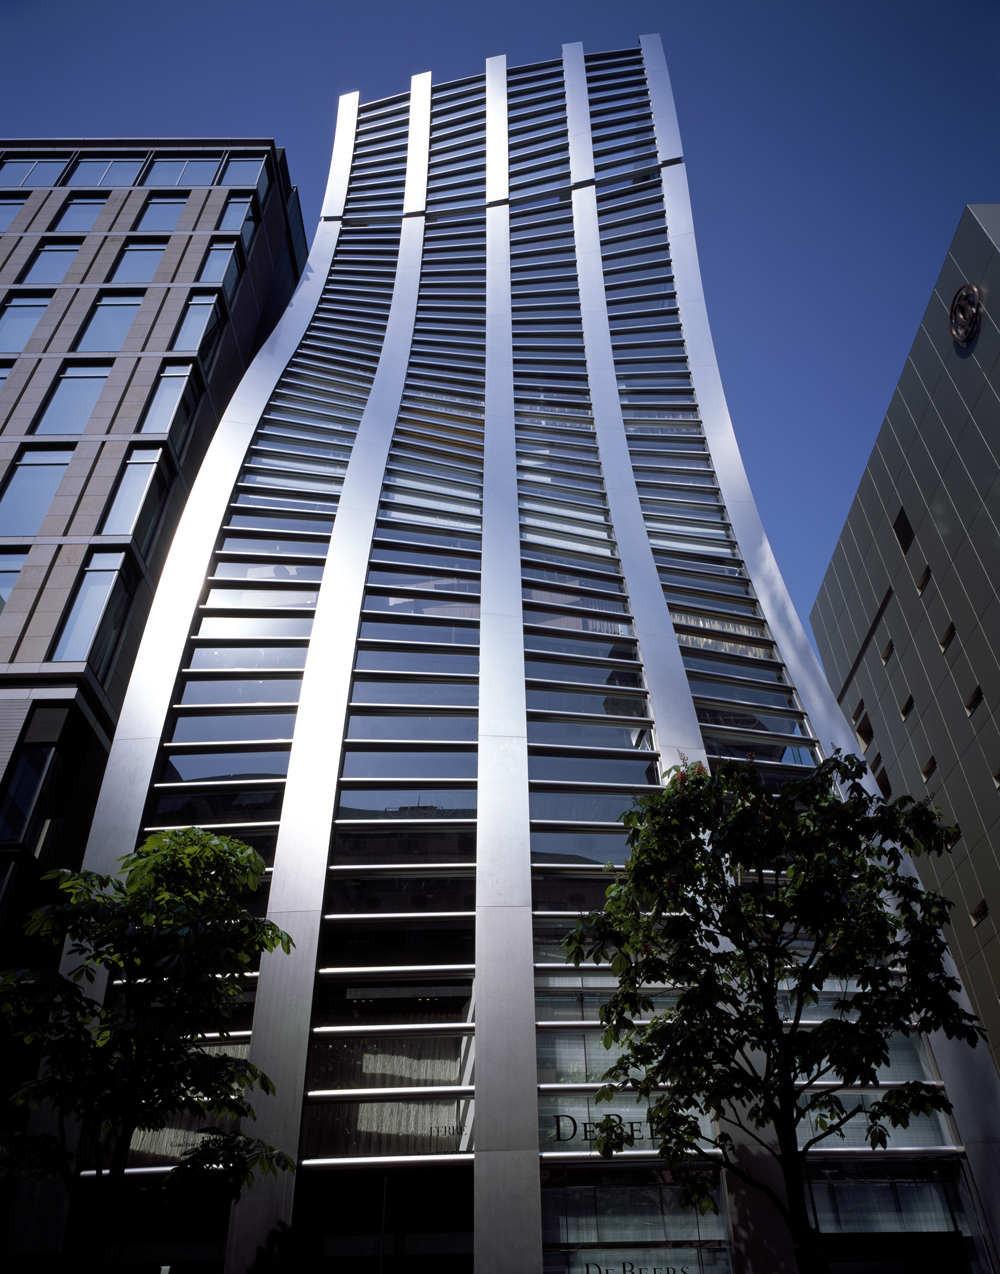 De Beers Ginza Building / Jun Mitsui & Associates Architects, © Naoomi Kurozumi